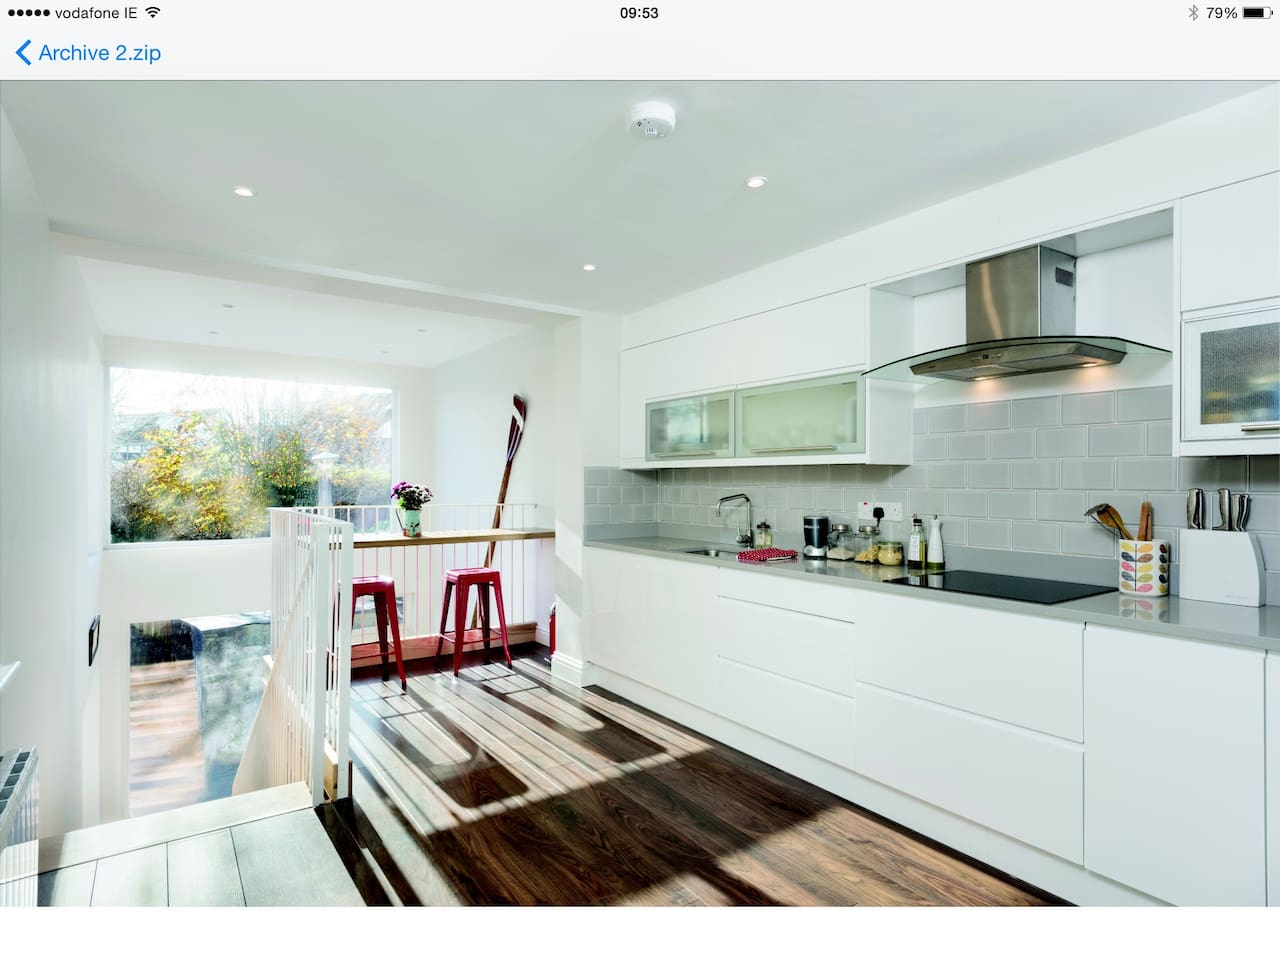 Kitchen with breakfast bar overlooking mezzanine